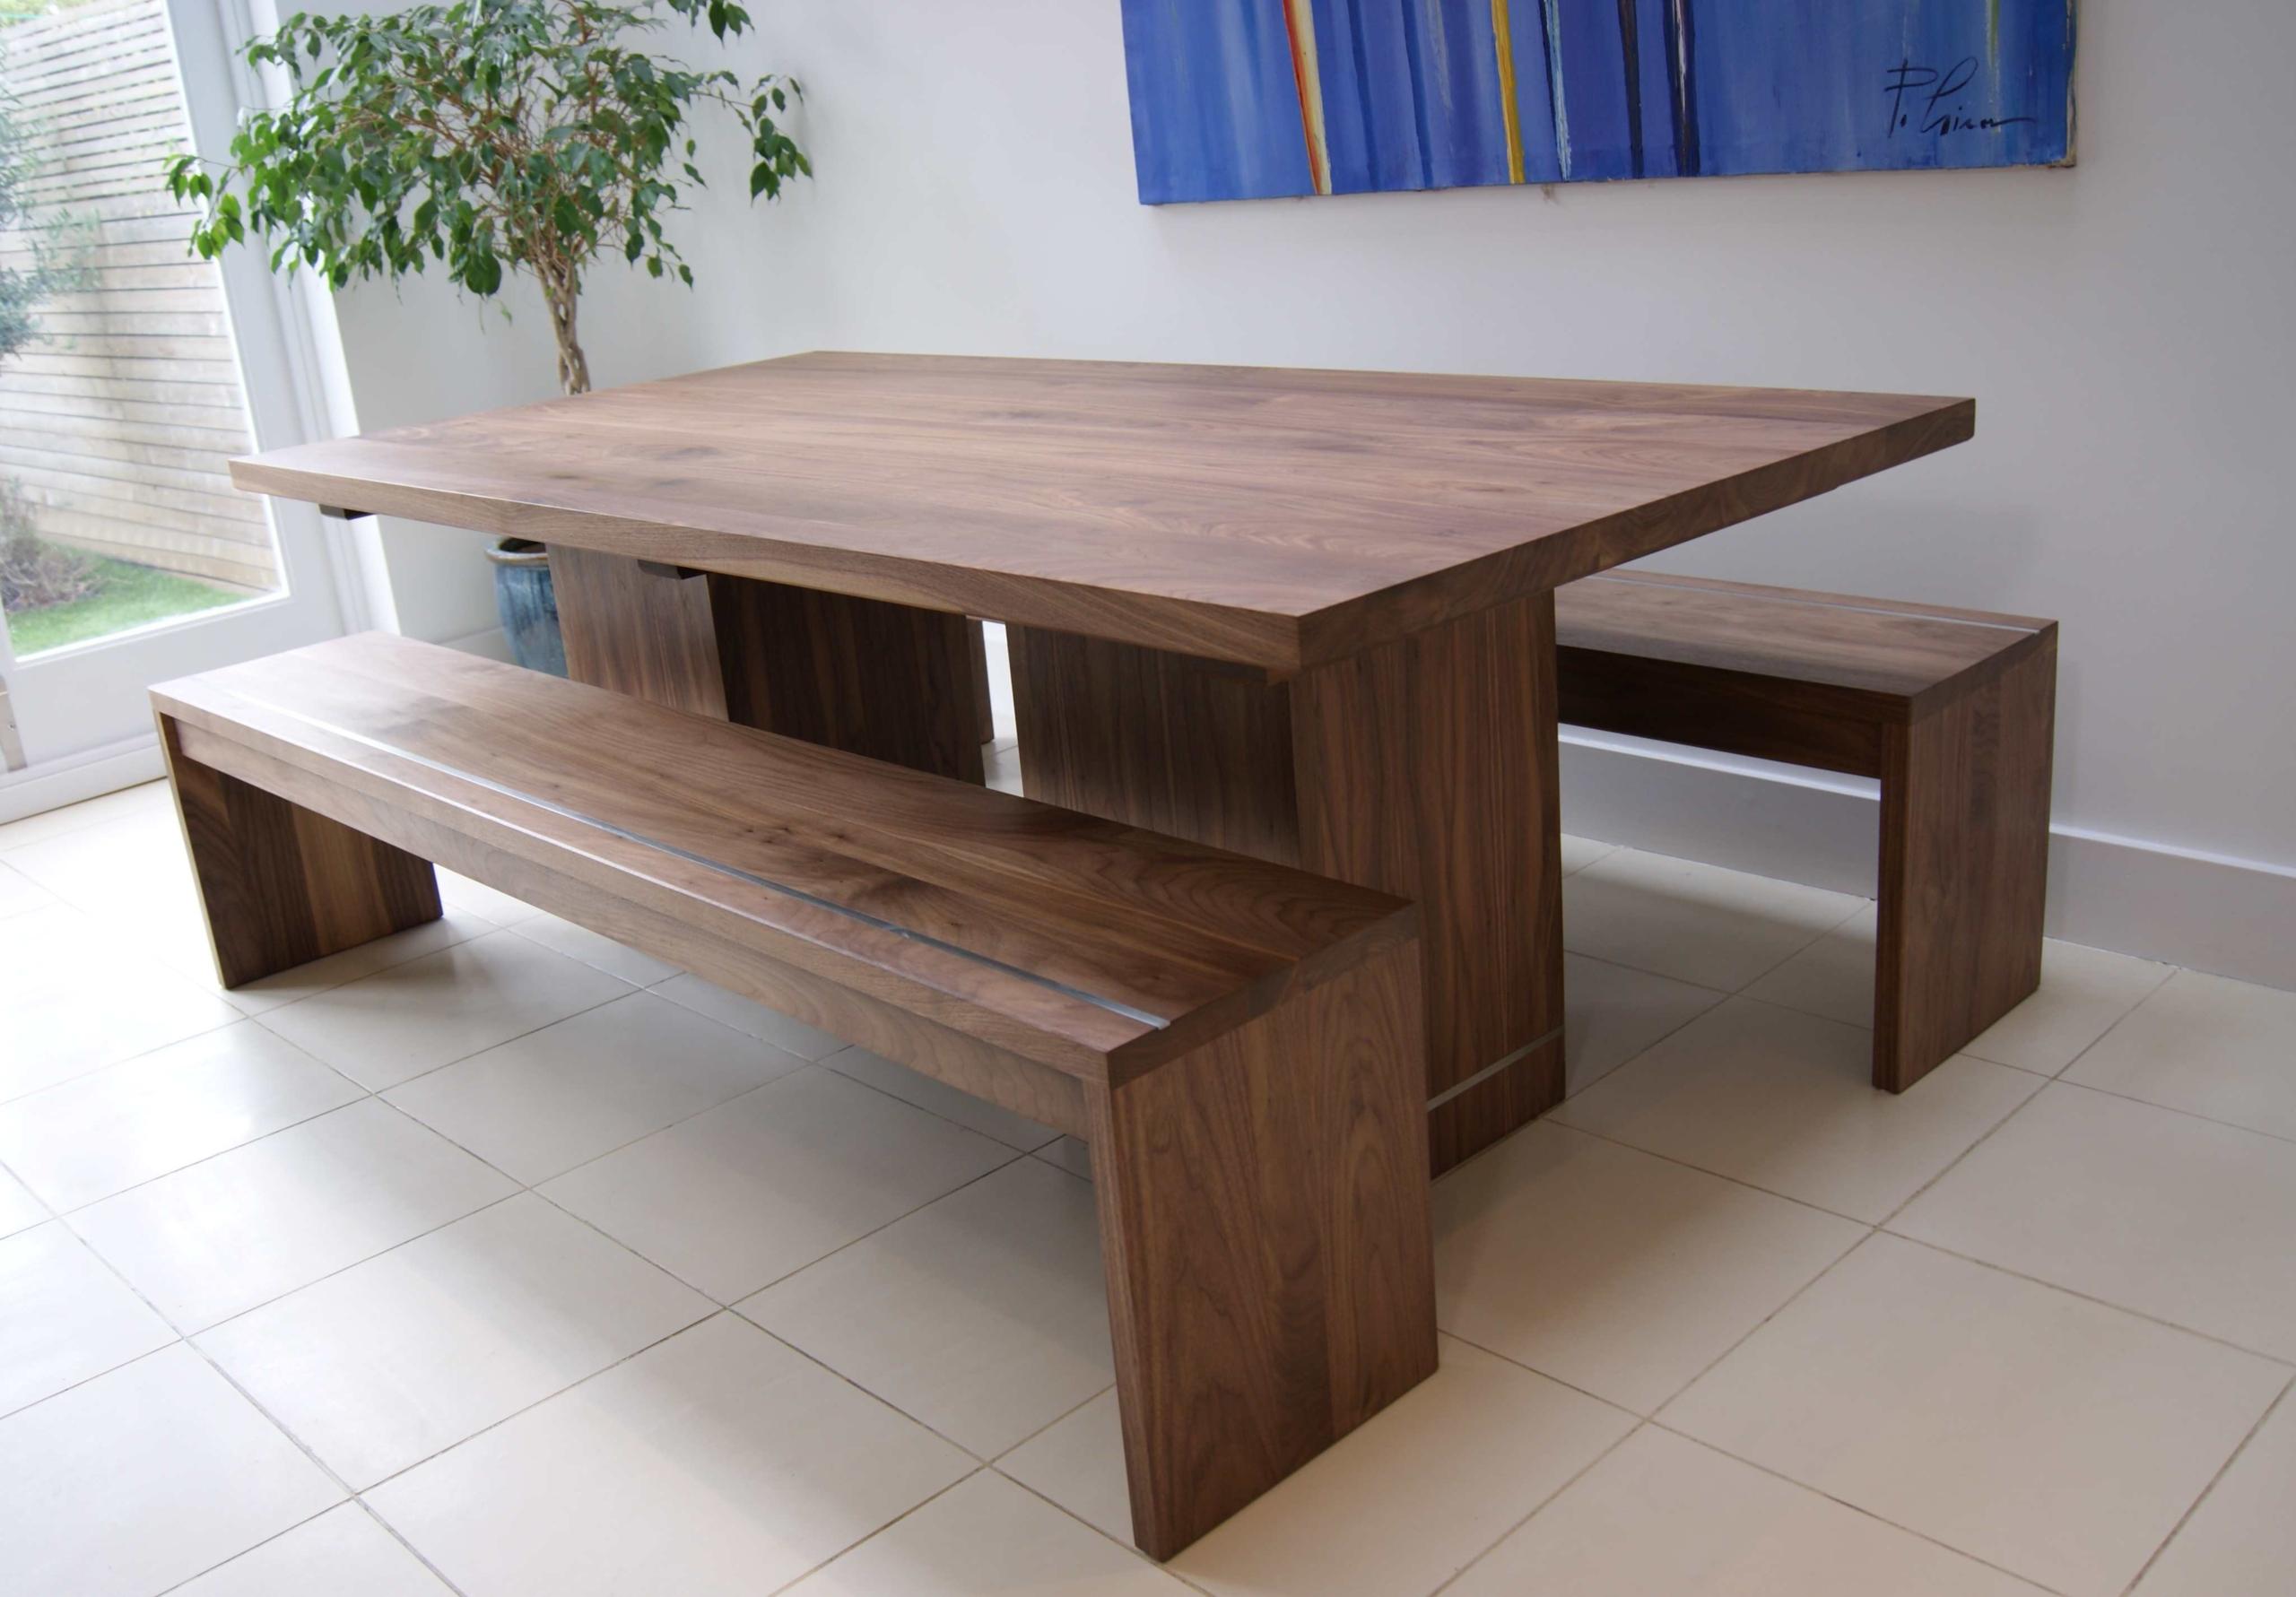 Ordinaire Walnut Dining Table U0026 Benches   MijMoj